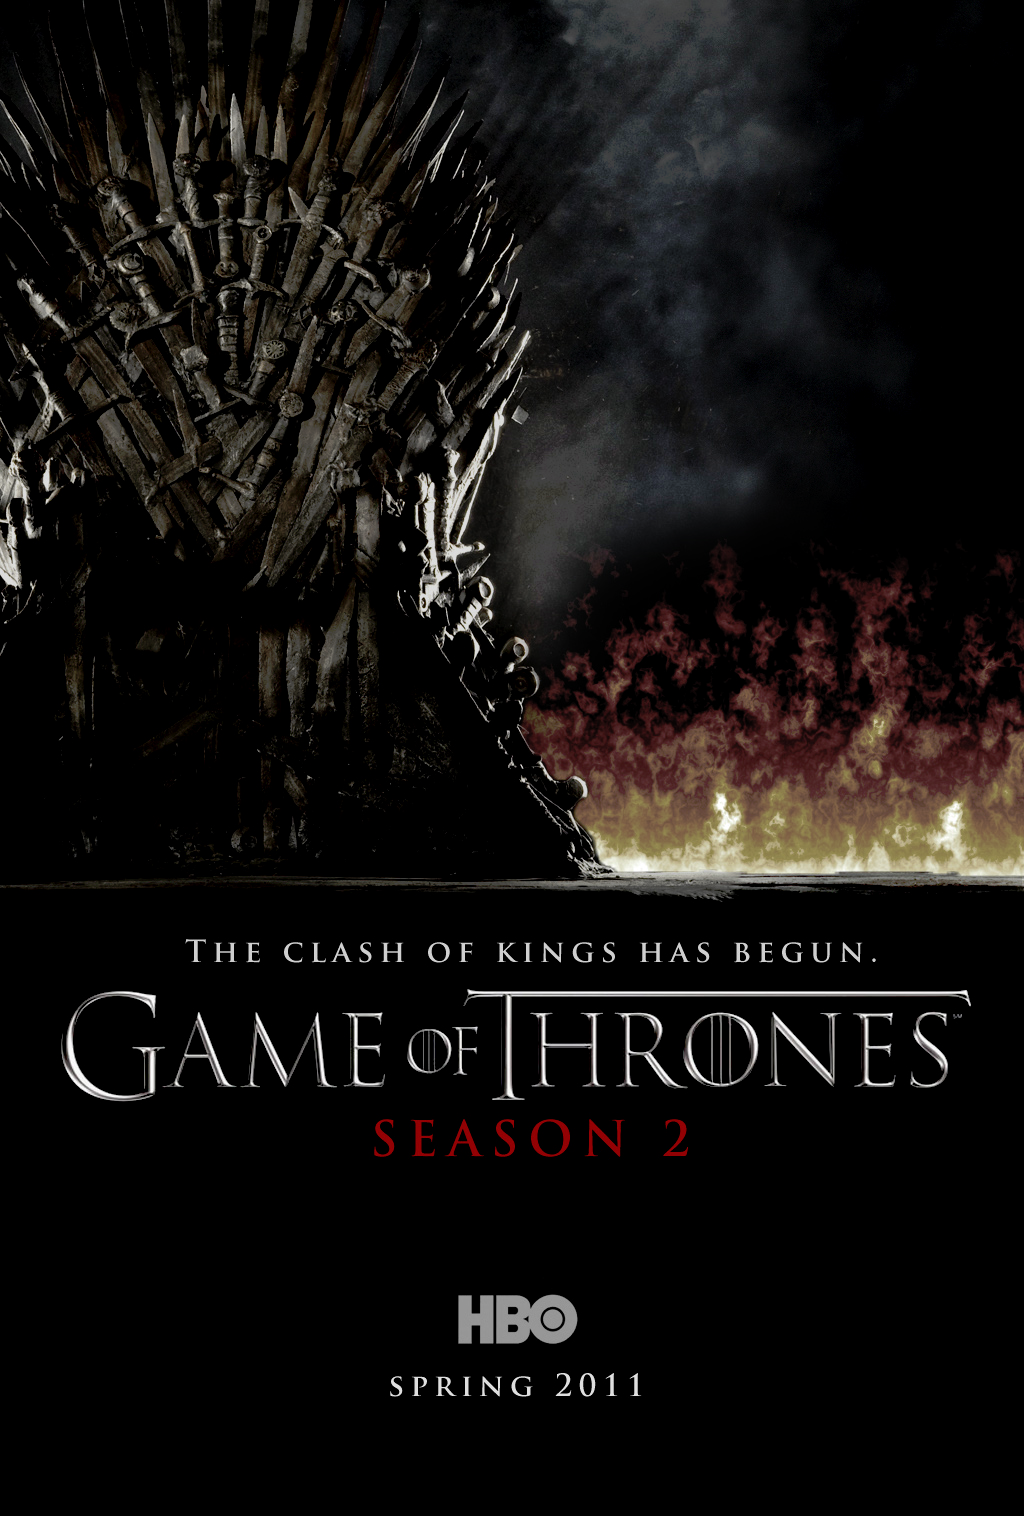 Game Of Thrones Fan Art Game Of Thrones Season 2 Poster Game Of Thrones Episodes Game Of Thrones Tv Game Of Thrones